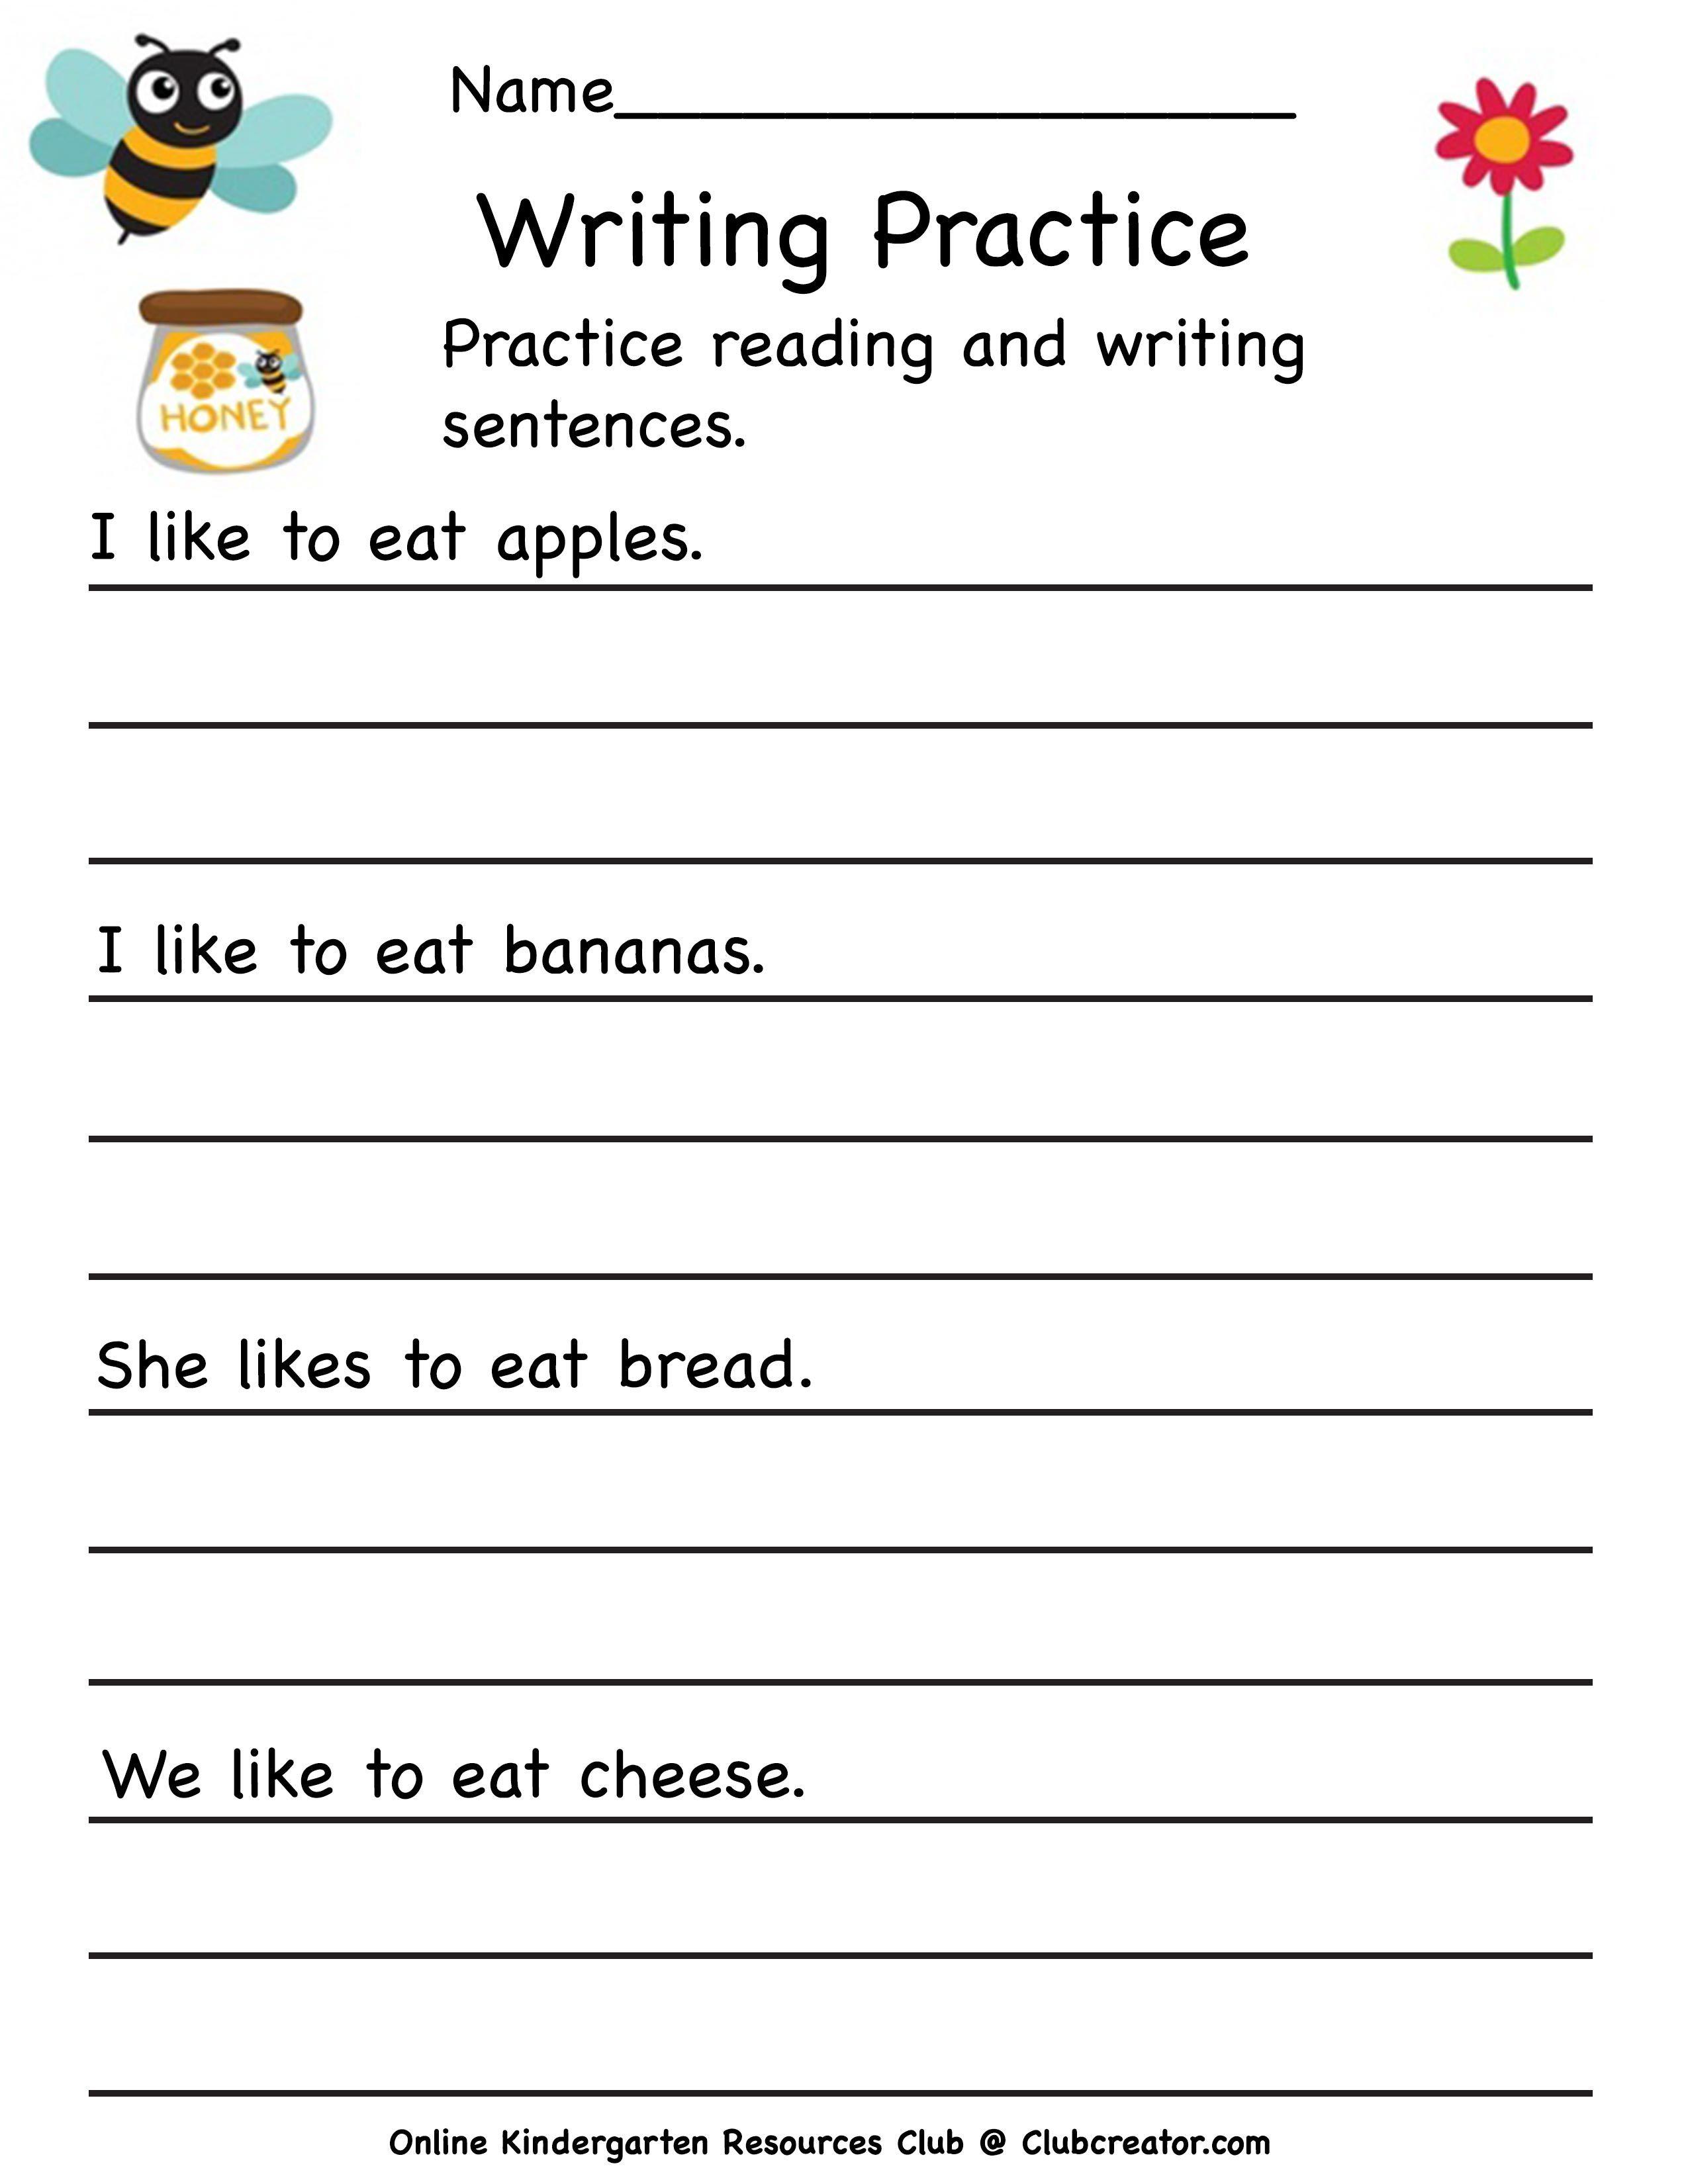 Kindergarten Writing Worksheet In